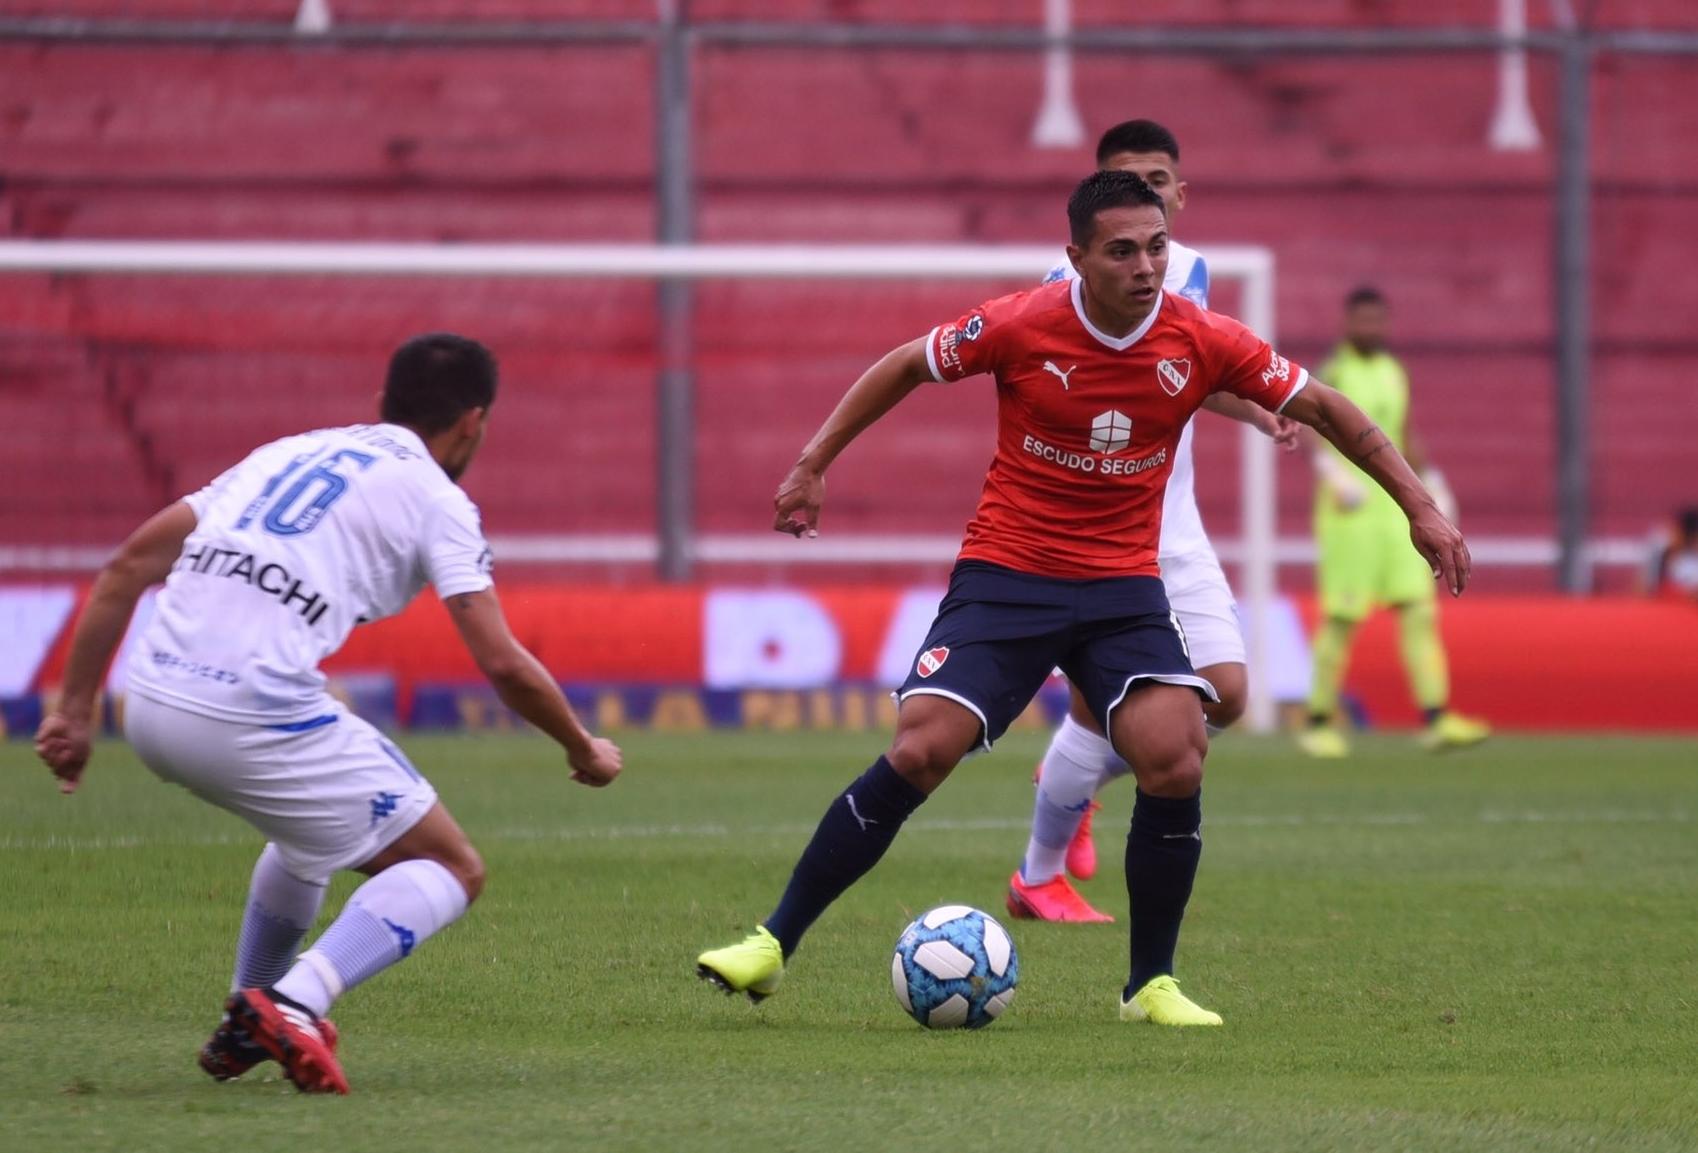 Lucas González se ilusiona con ser campeón en Independiente